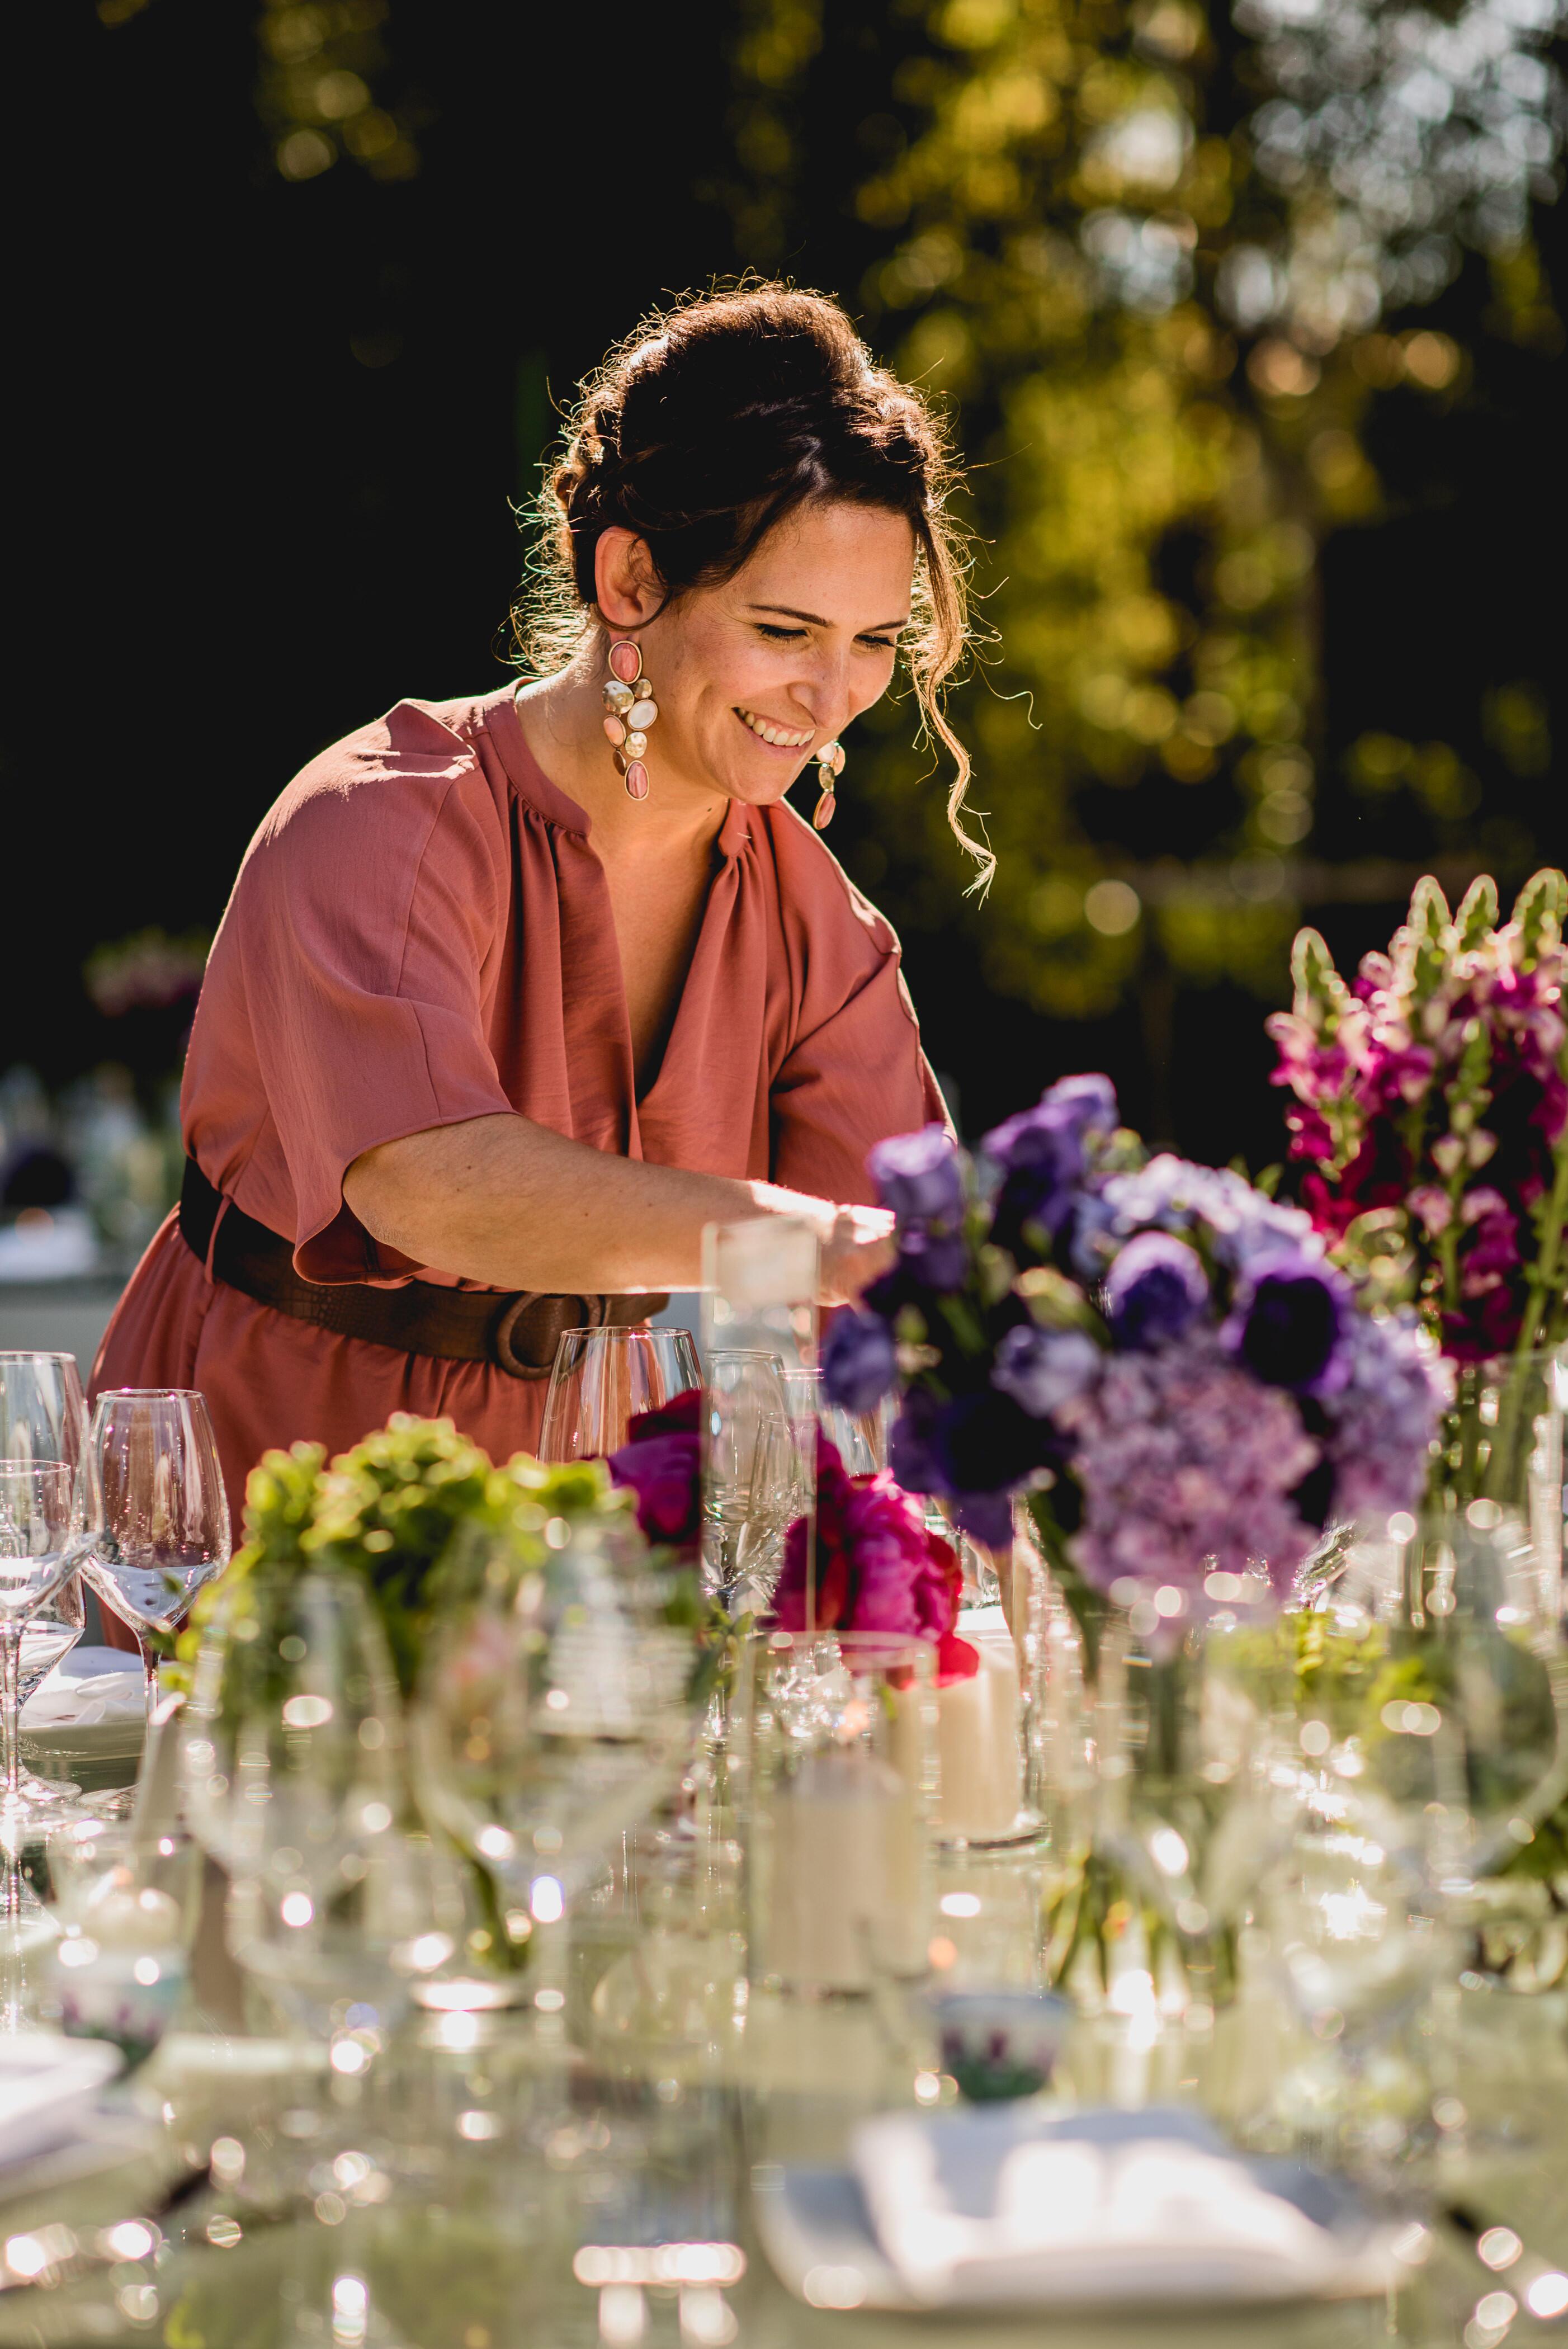 Susana Santos Wedding & event planner since 2009